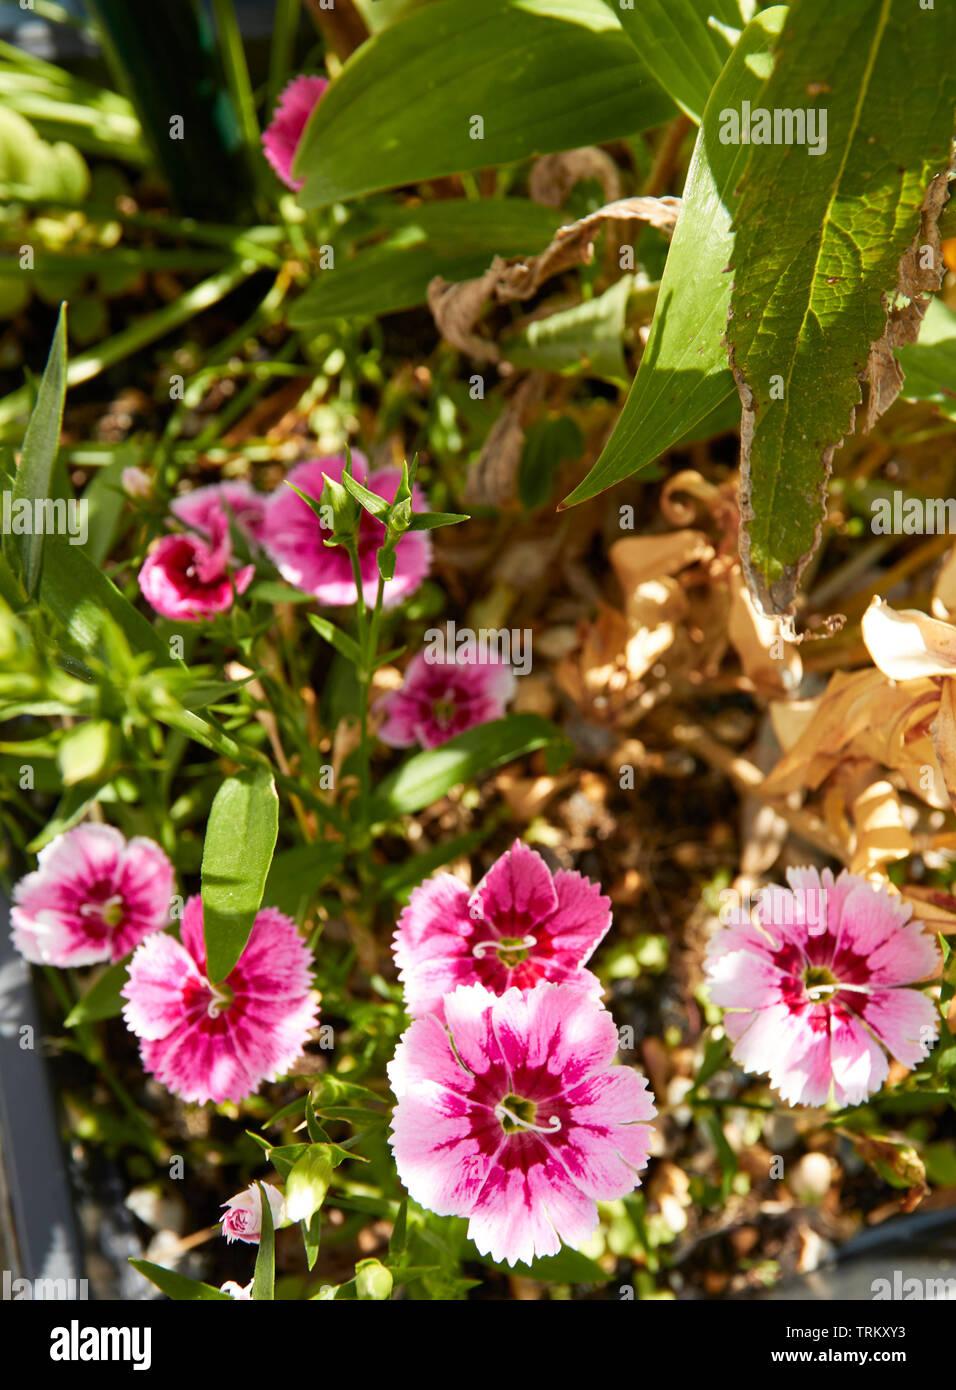 Pinks, Dianthus, in flower nature flower portrait in a London garden - Stock Image